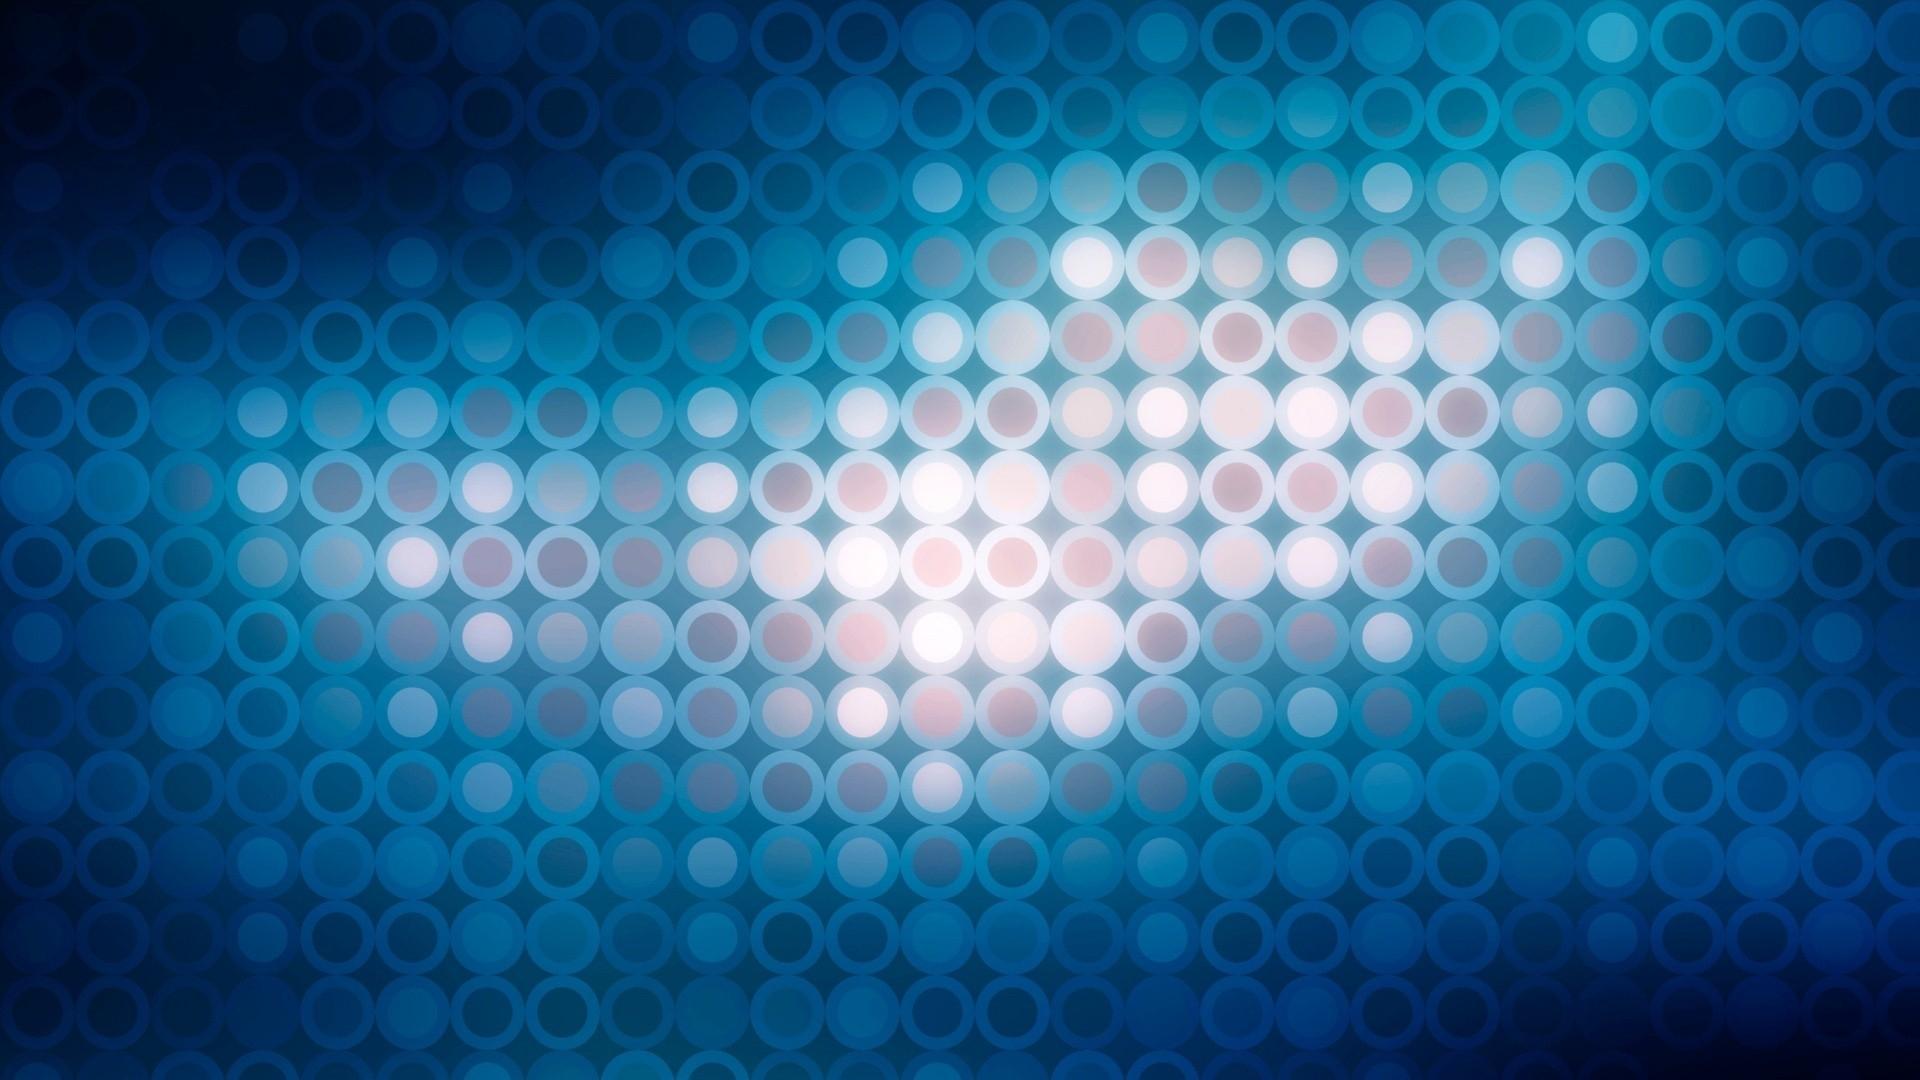 3D & Abstract Digital Background wallpapers (Desktop, Phone, Tablet ...